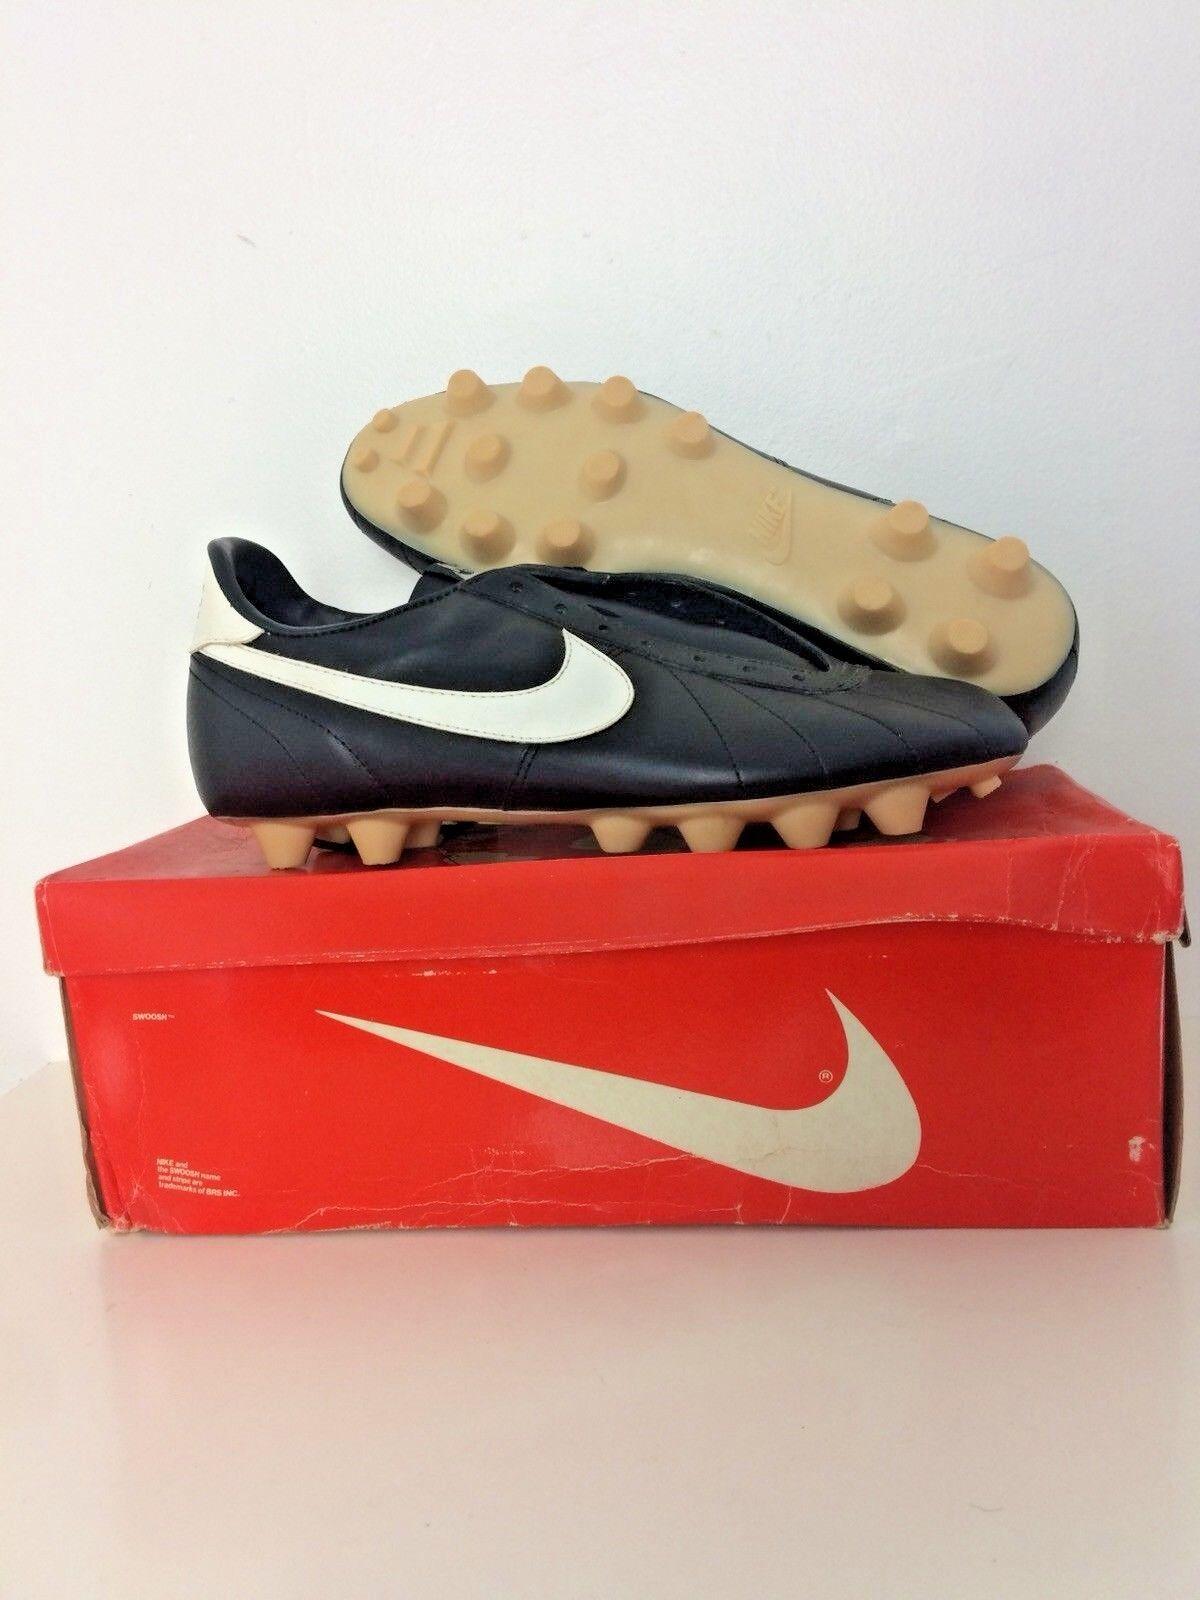 DEADSTOCK Vintage años 80 Nike Nike Nike Botines de Europa tamaño 11 Hecho En Corea a07640